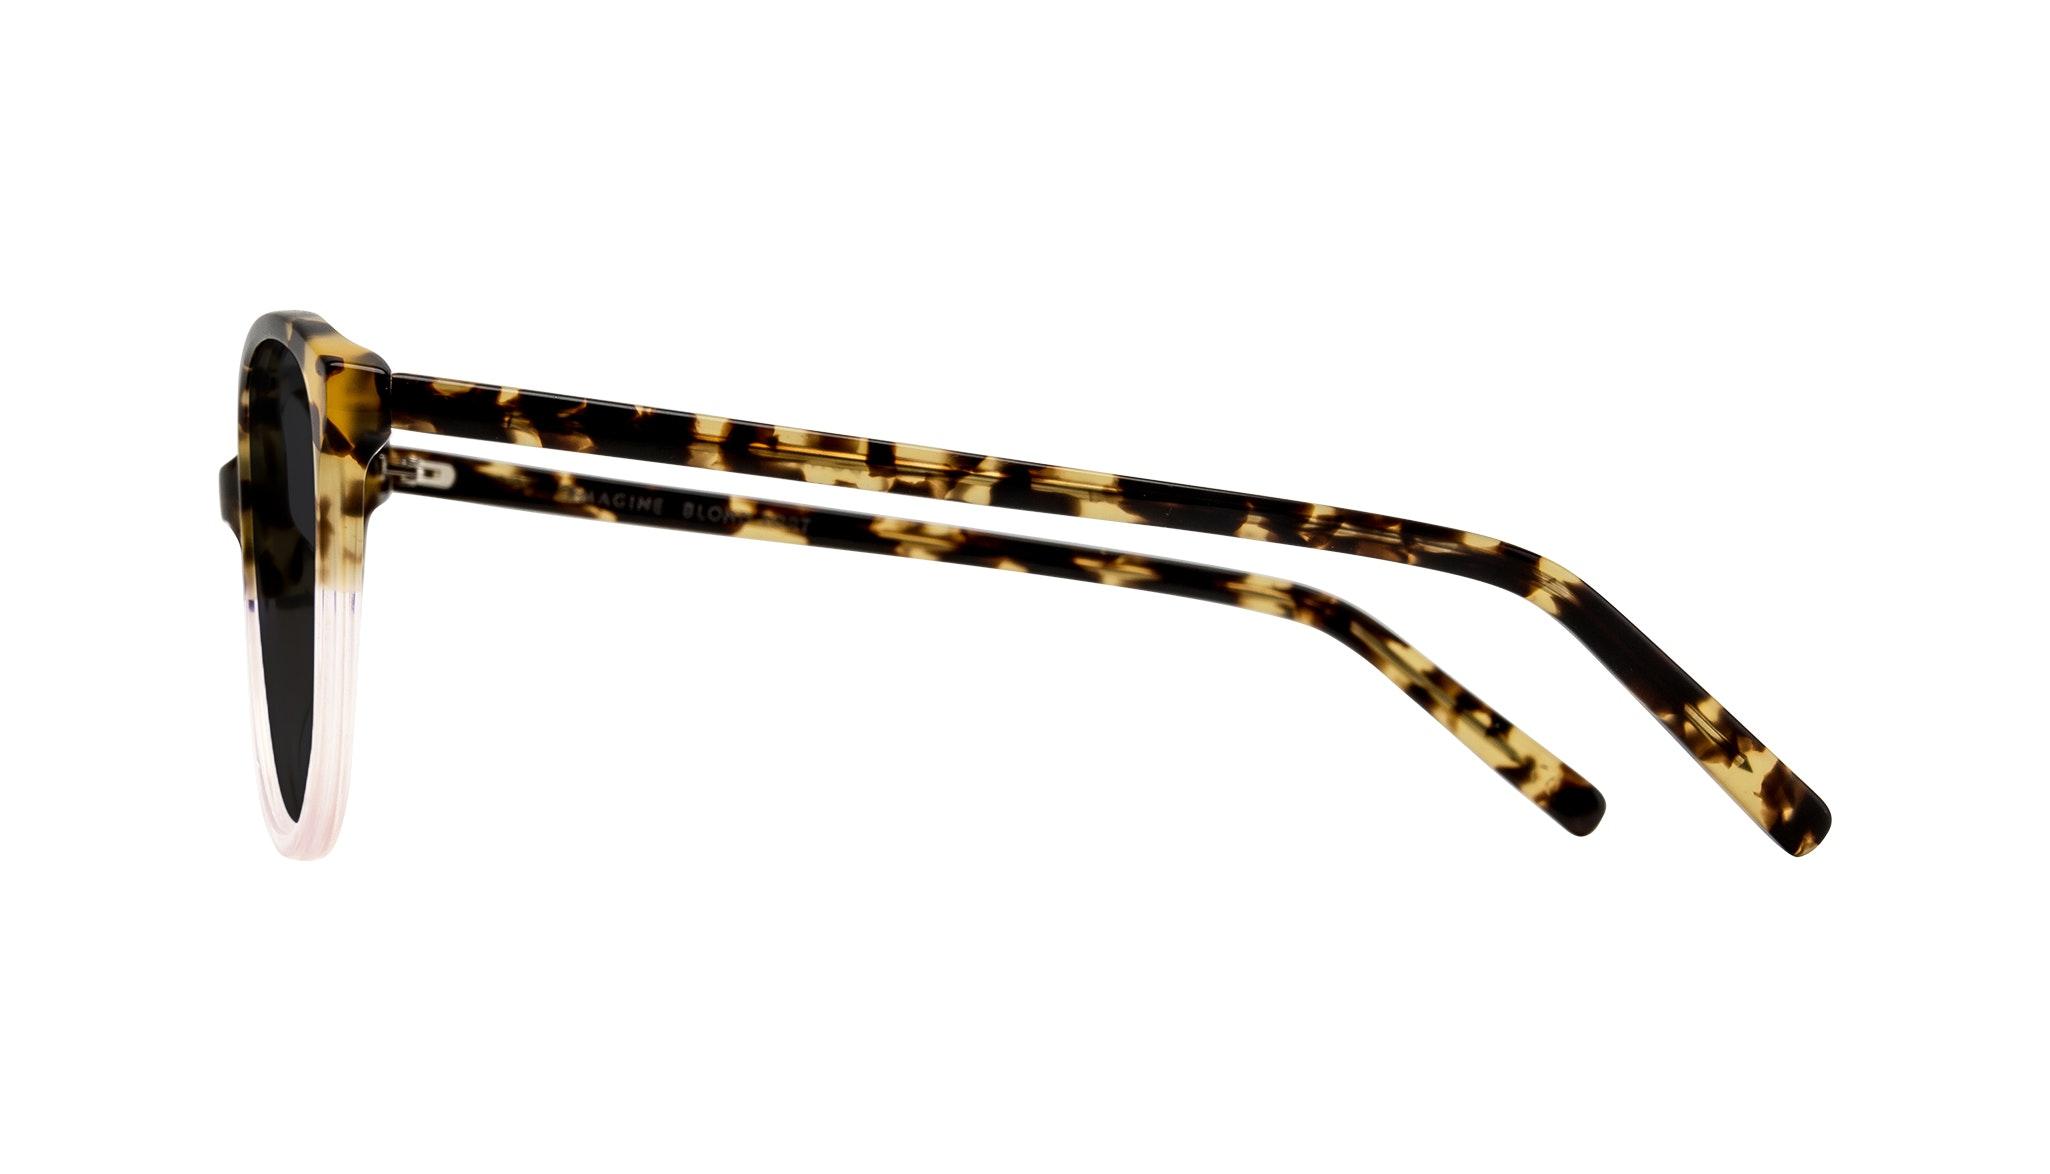 Affordable Fashion Glasses Round Sunglasses Women Imagine Blond Tort Side